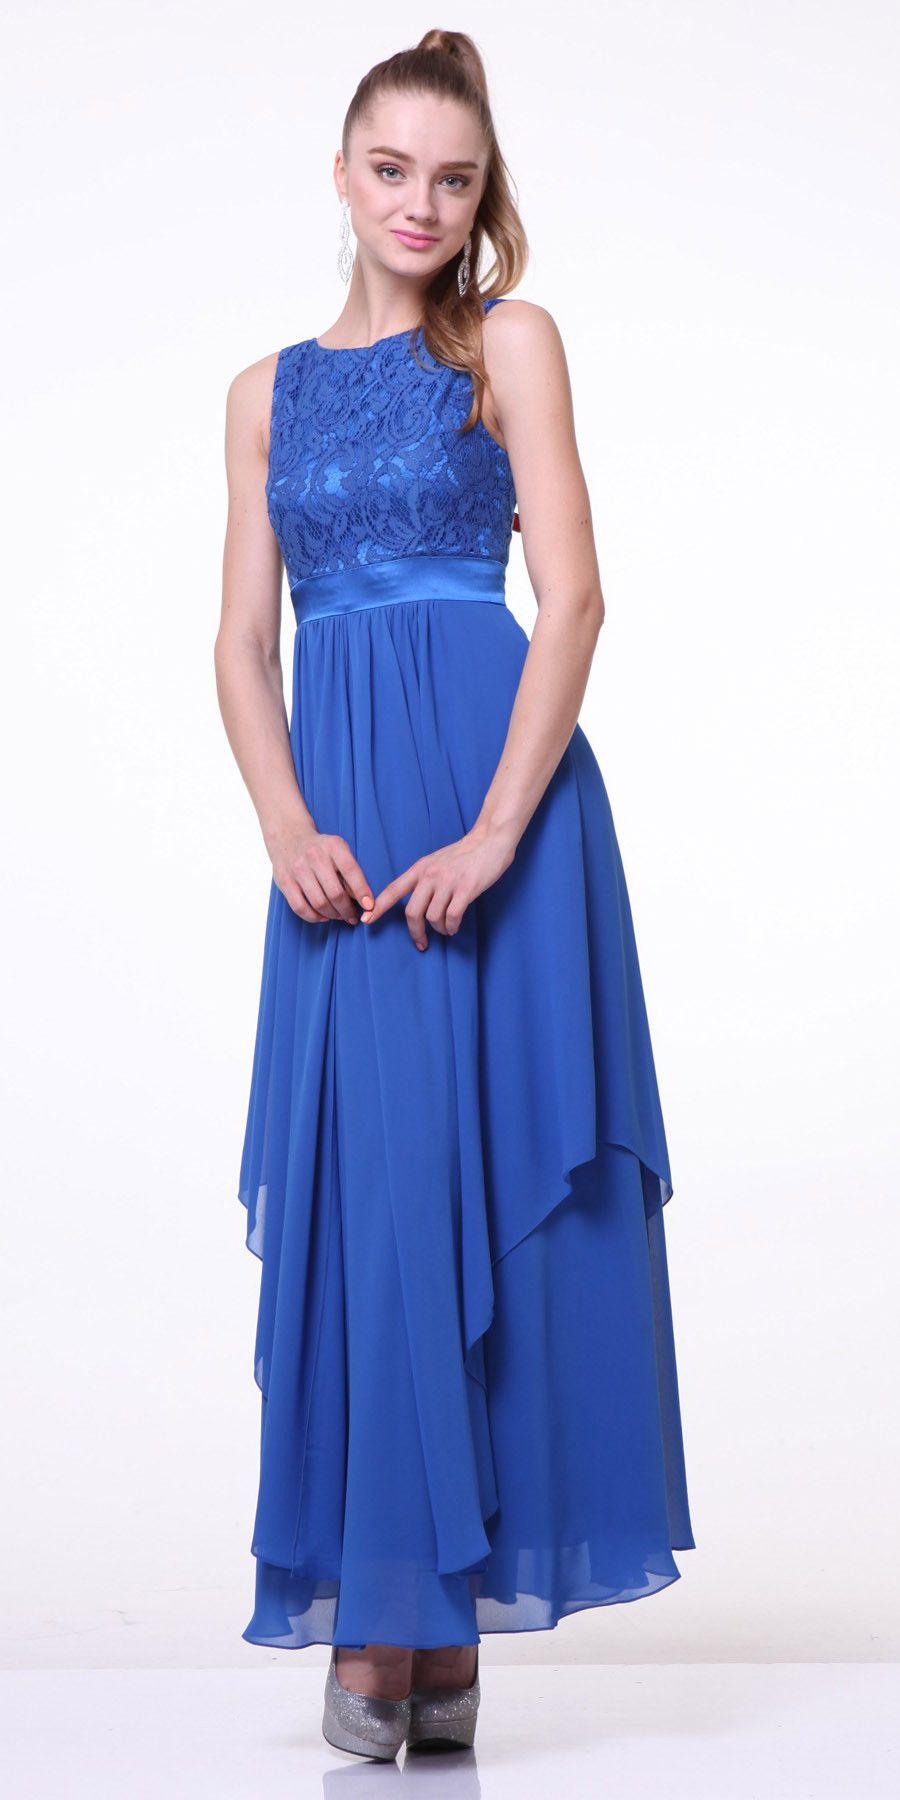 Clearance tea length bridesmaid dress royal blue lace top wide